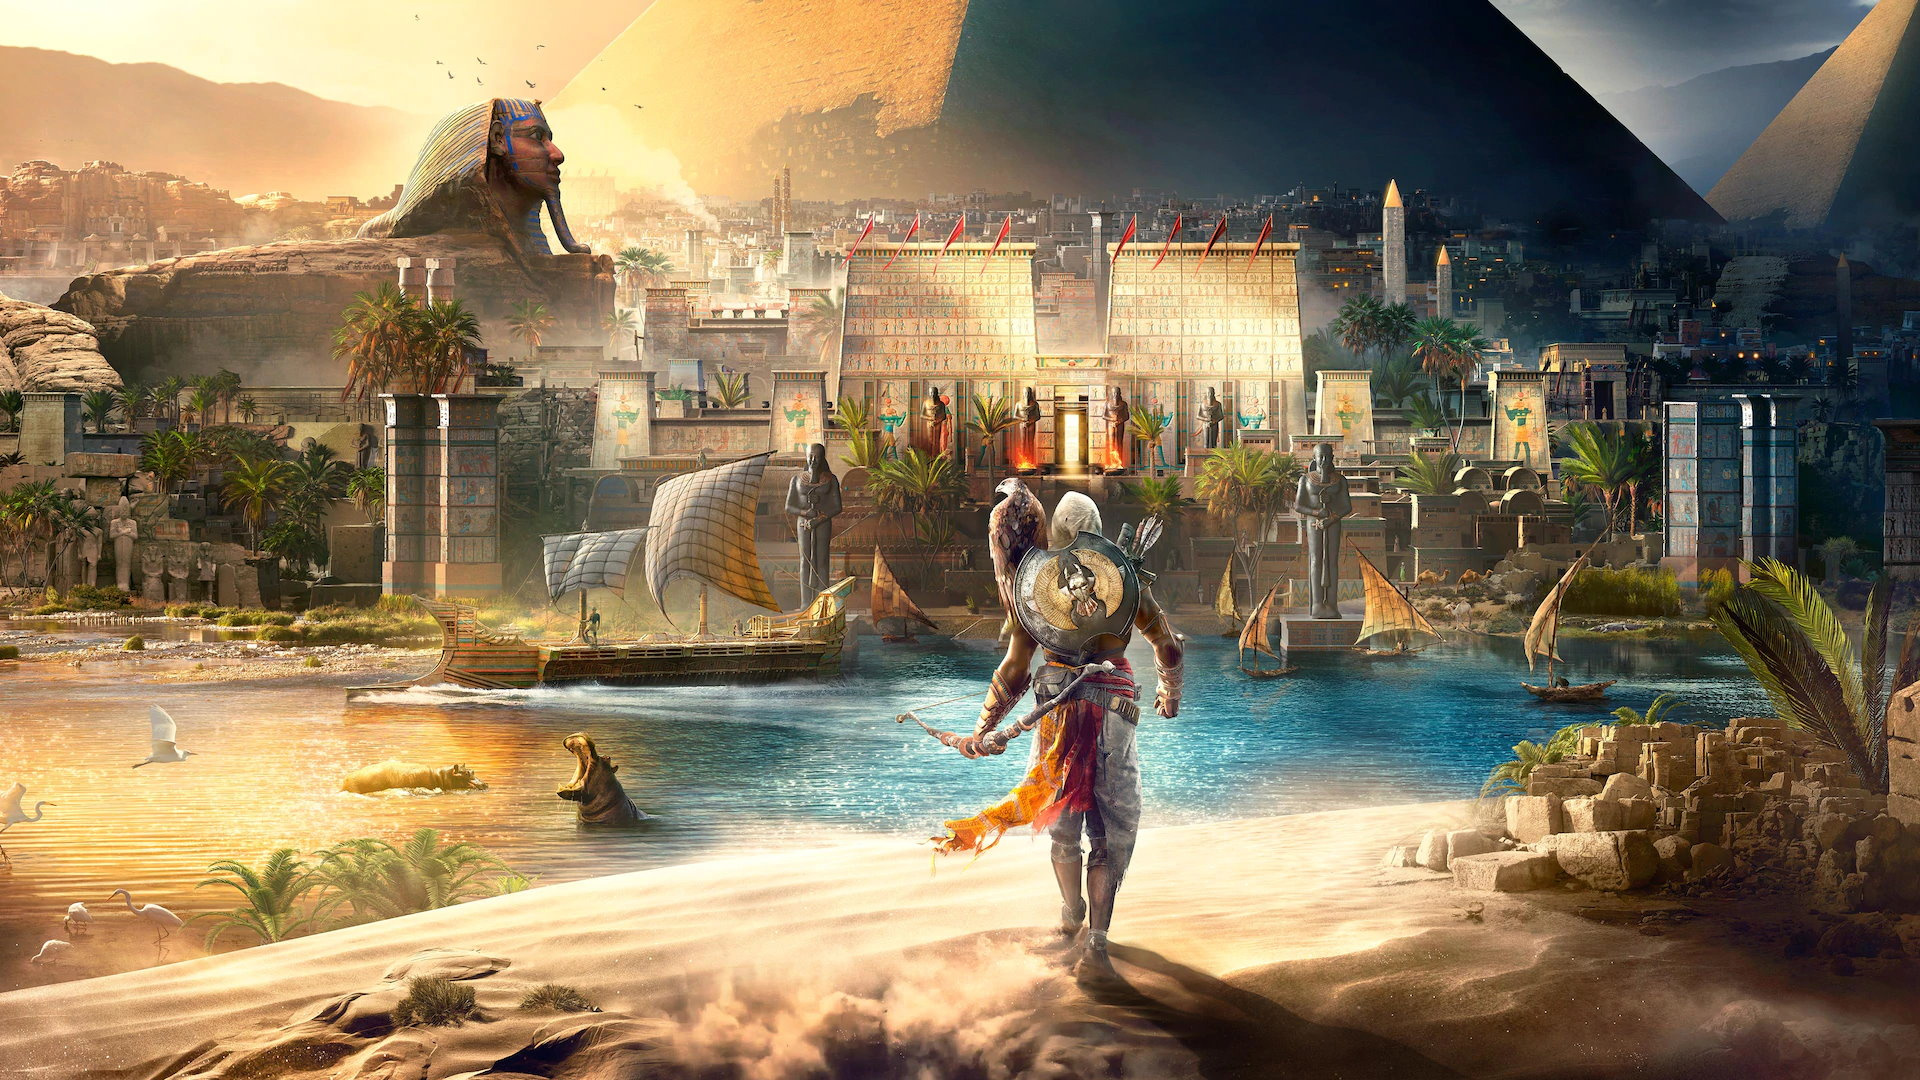 Распродажа в PS Store: Assassin's Creed Origins, Control, Metal Gear Solid V, Shenmue III и другие